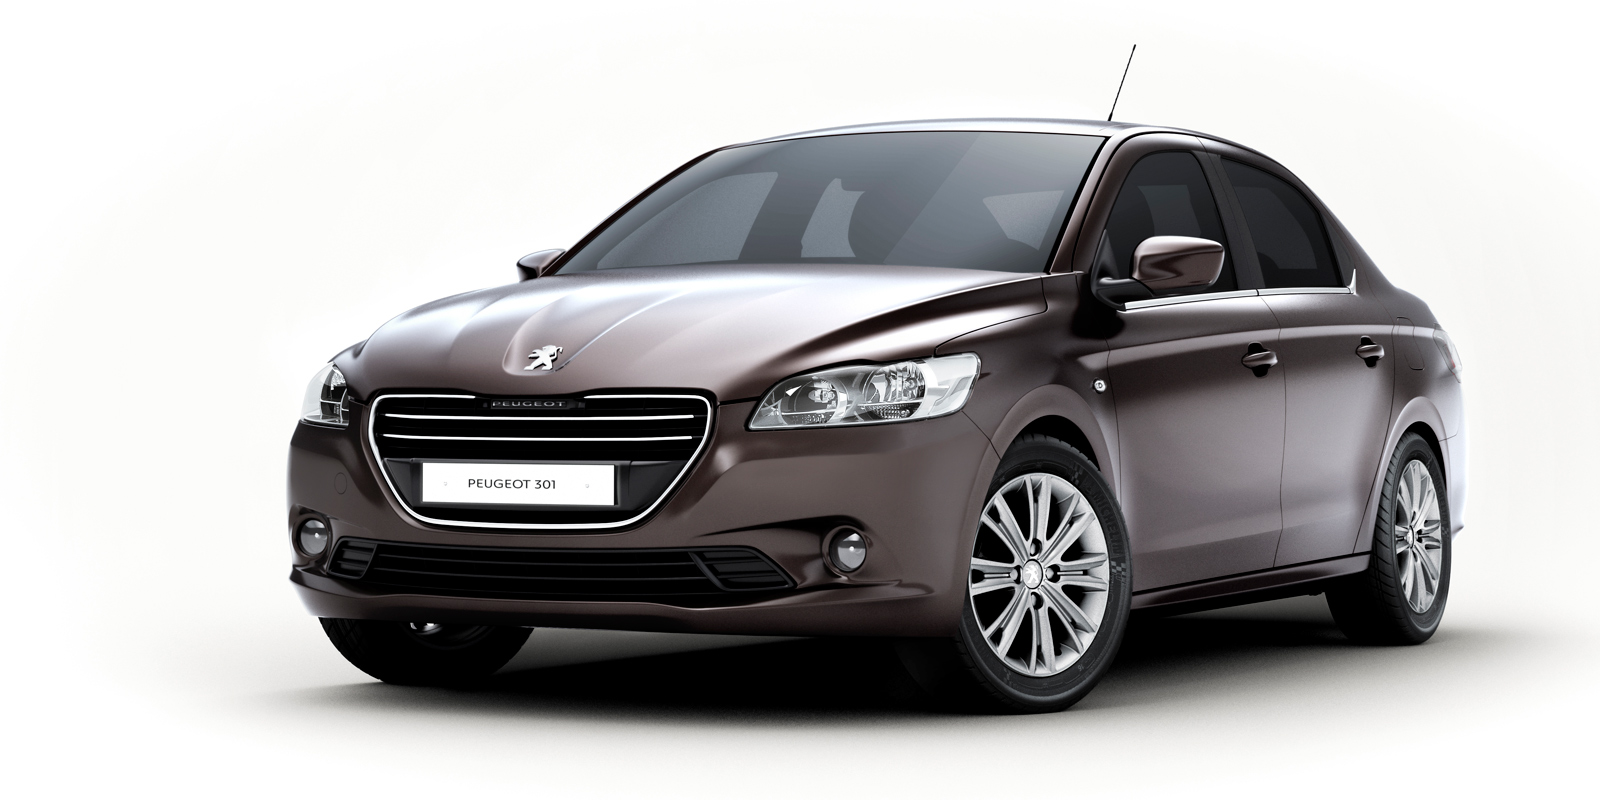 Peugeot 301 manual w wersji kombi i hatchback